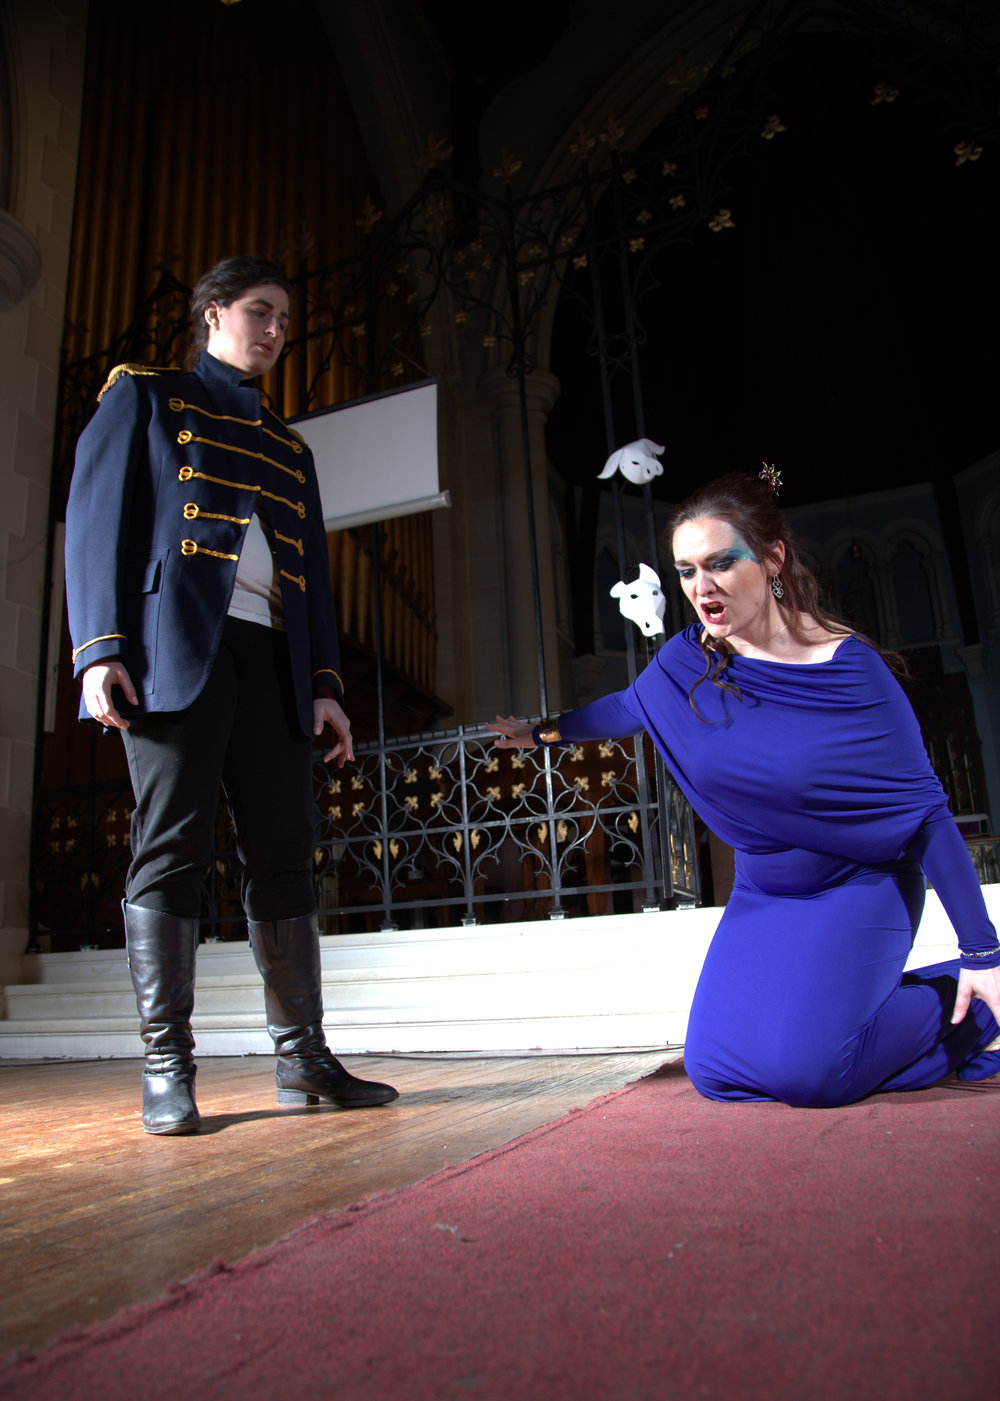 Laura Mitchell as Alcina and Rachel Selan as Ruggiero in Alcina. Photo credit: Samer Ghanem